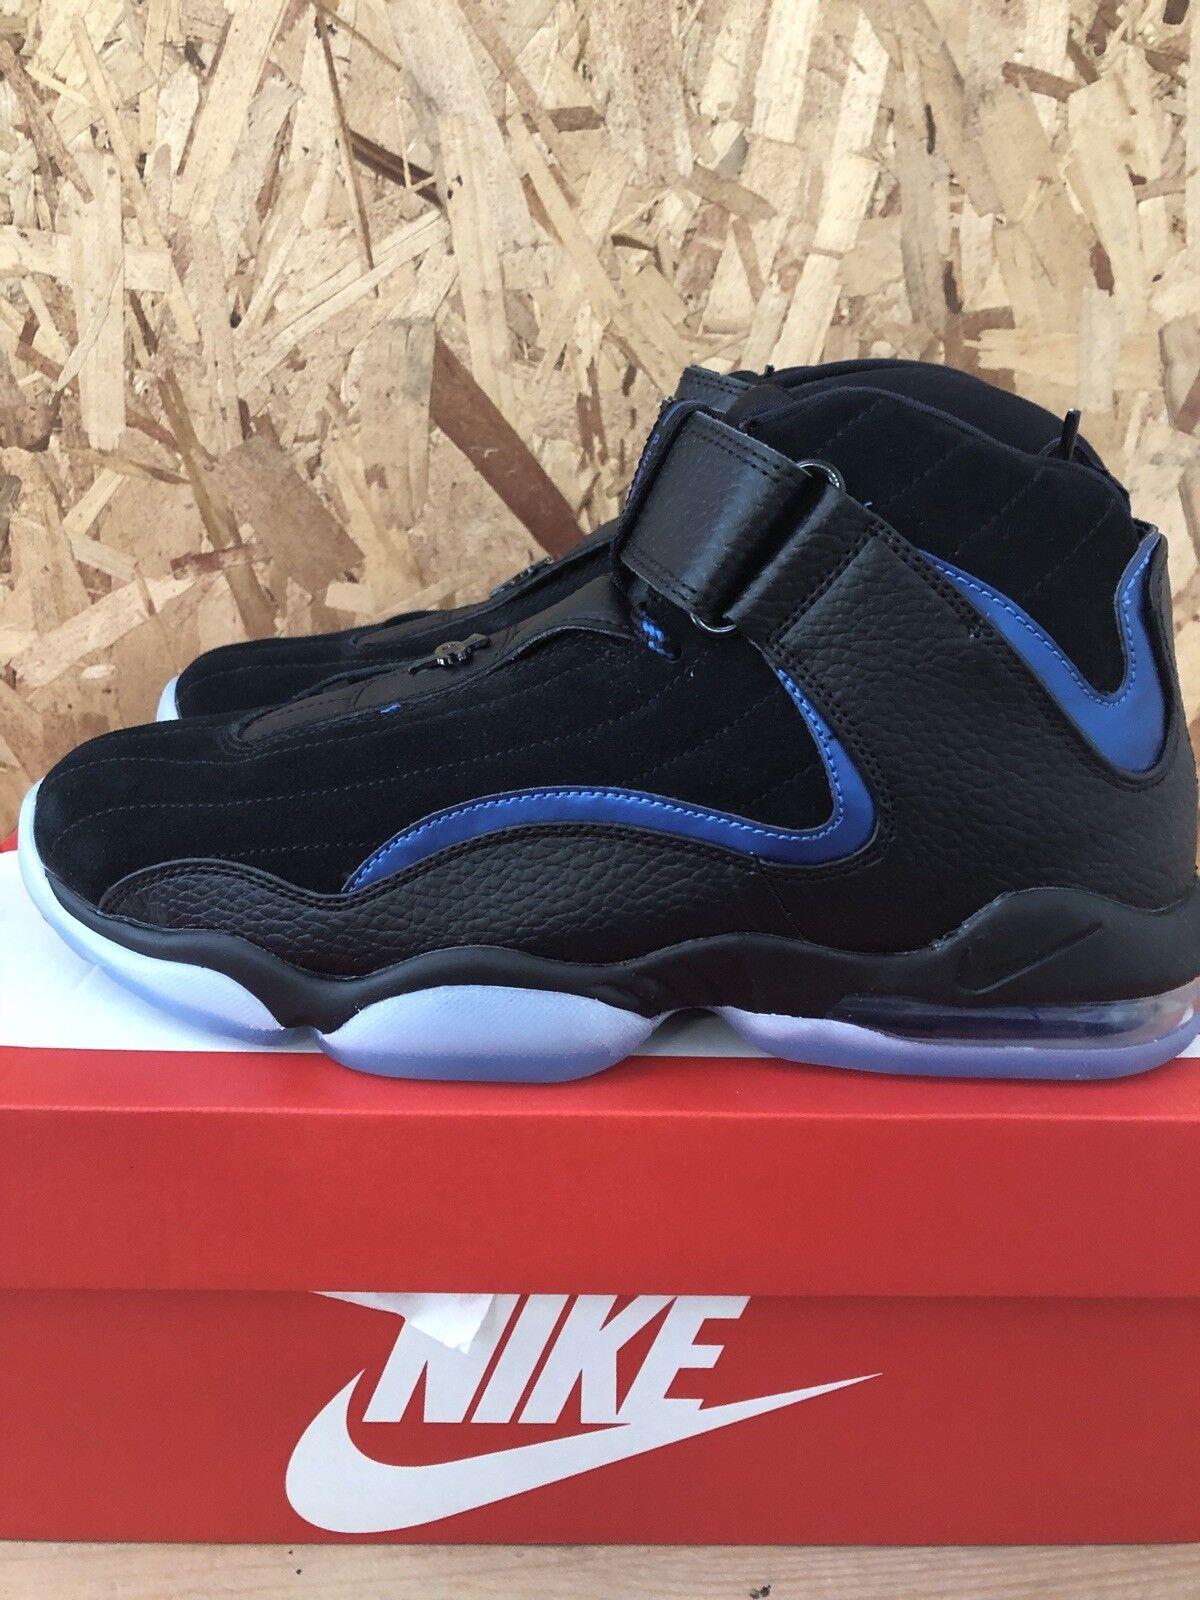 Nike - Air Penny IV - Black   Black Size 10.5 NEW bluee